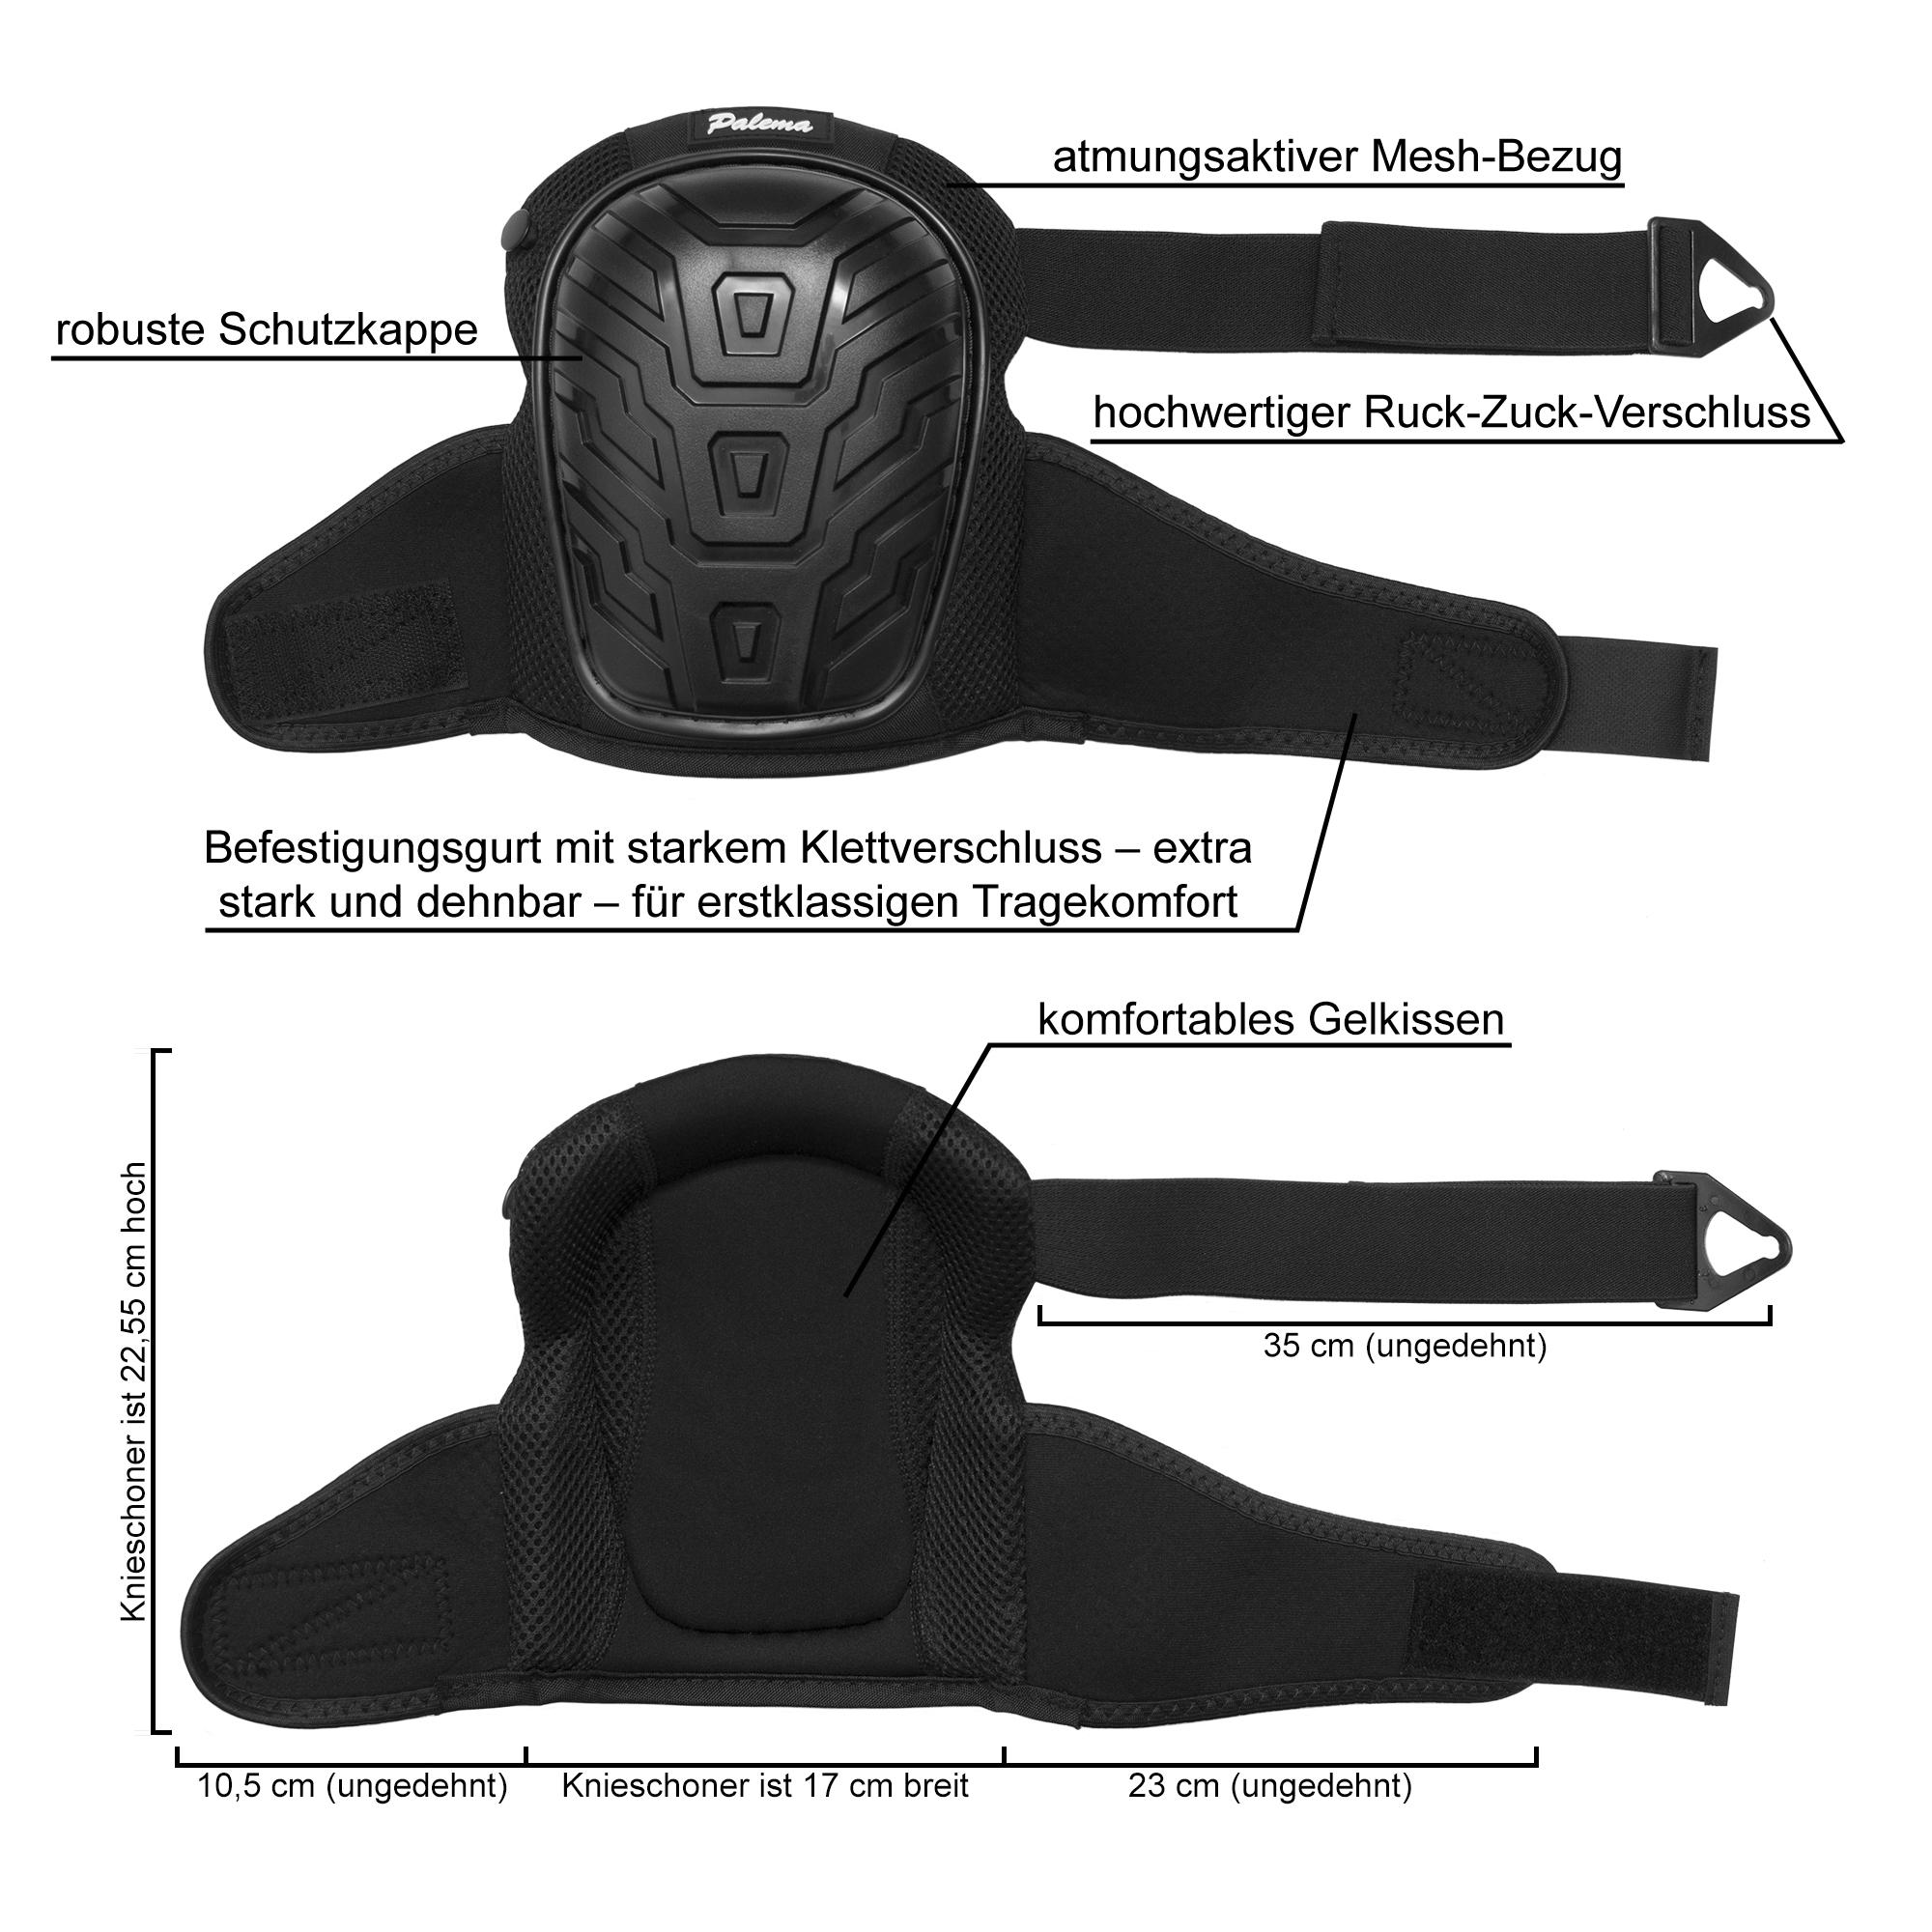 Knieschoner Detailansicht